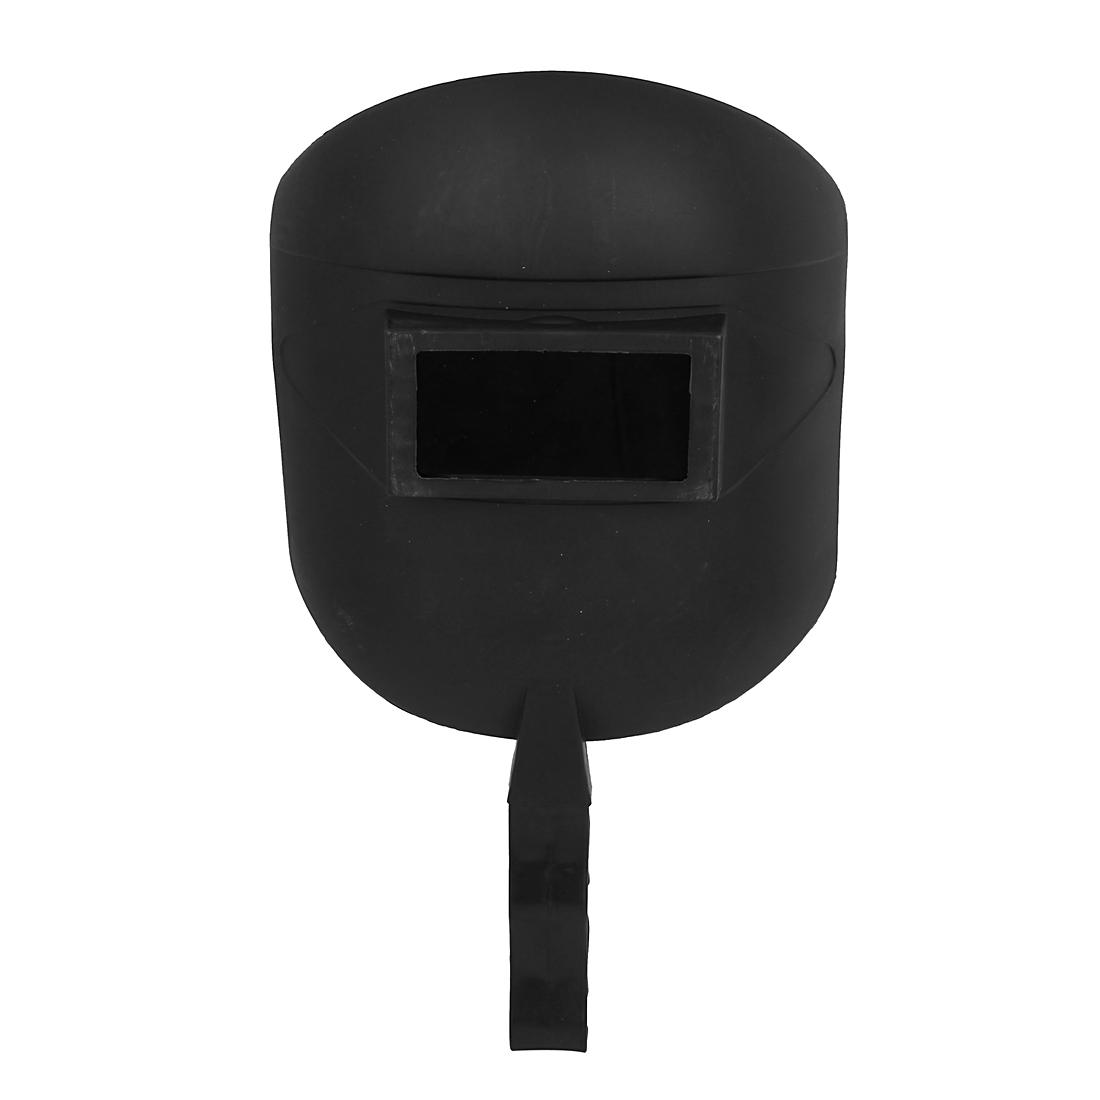 Black Plastic Detachable Safety Welding Helmet Handheld Mask Face Protector for Welder